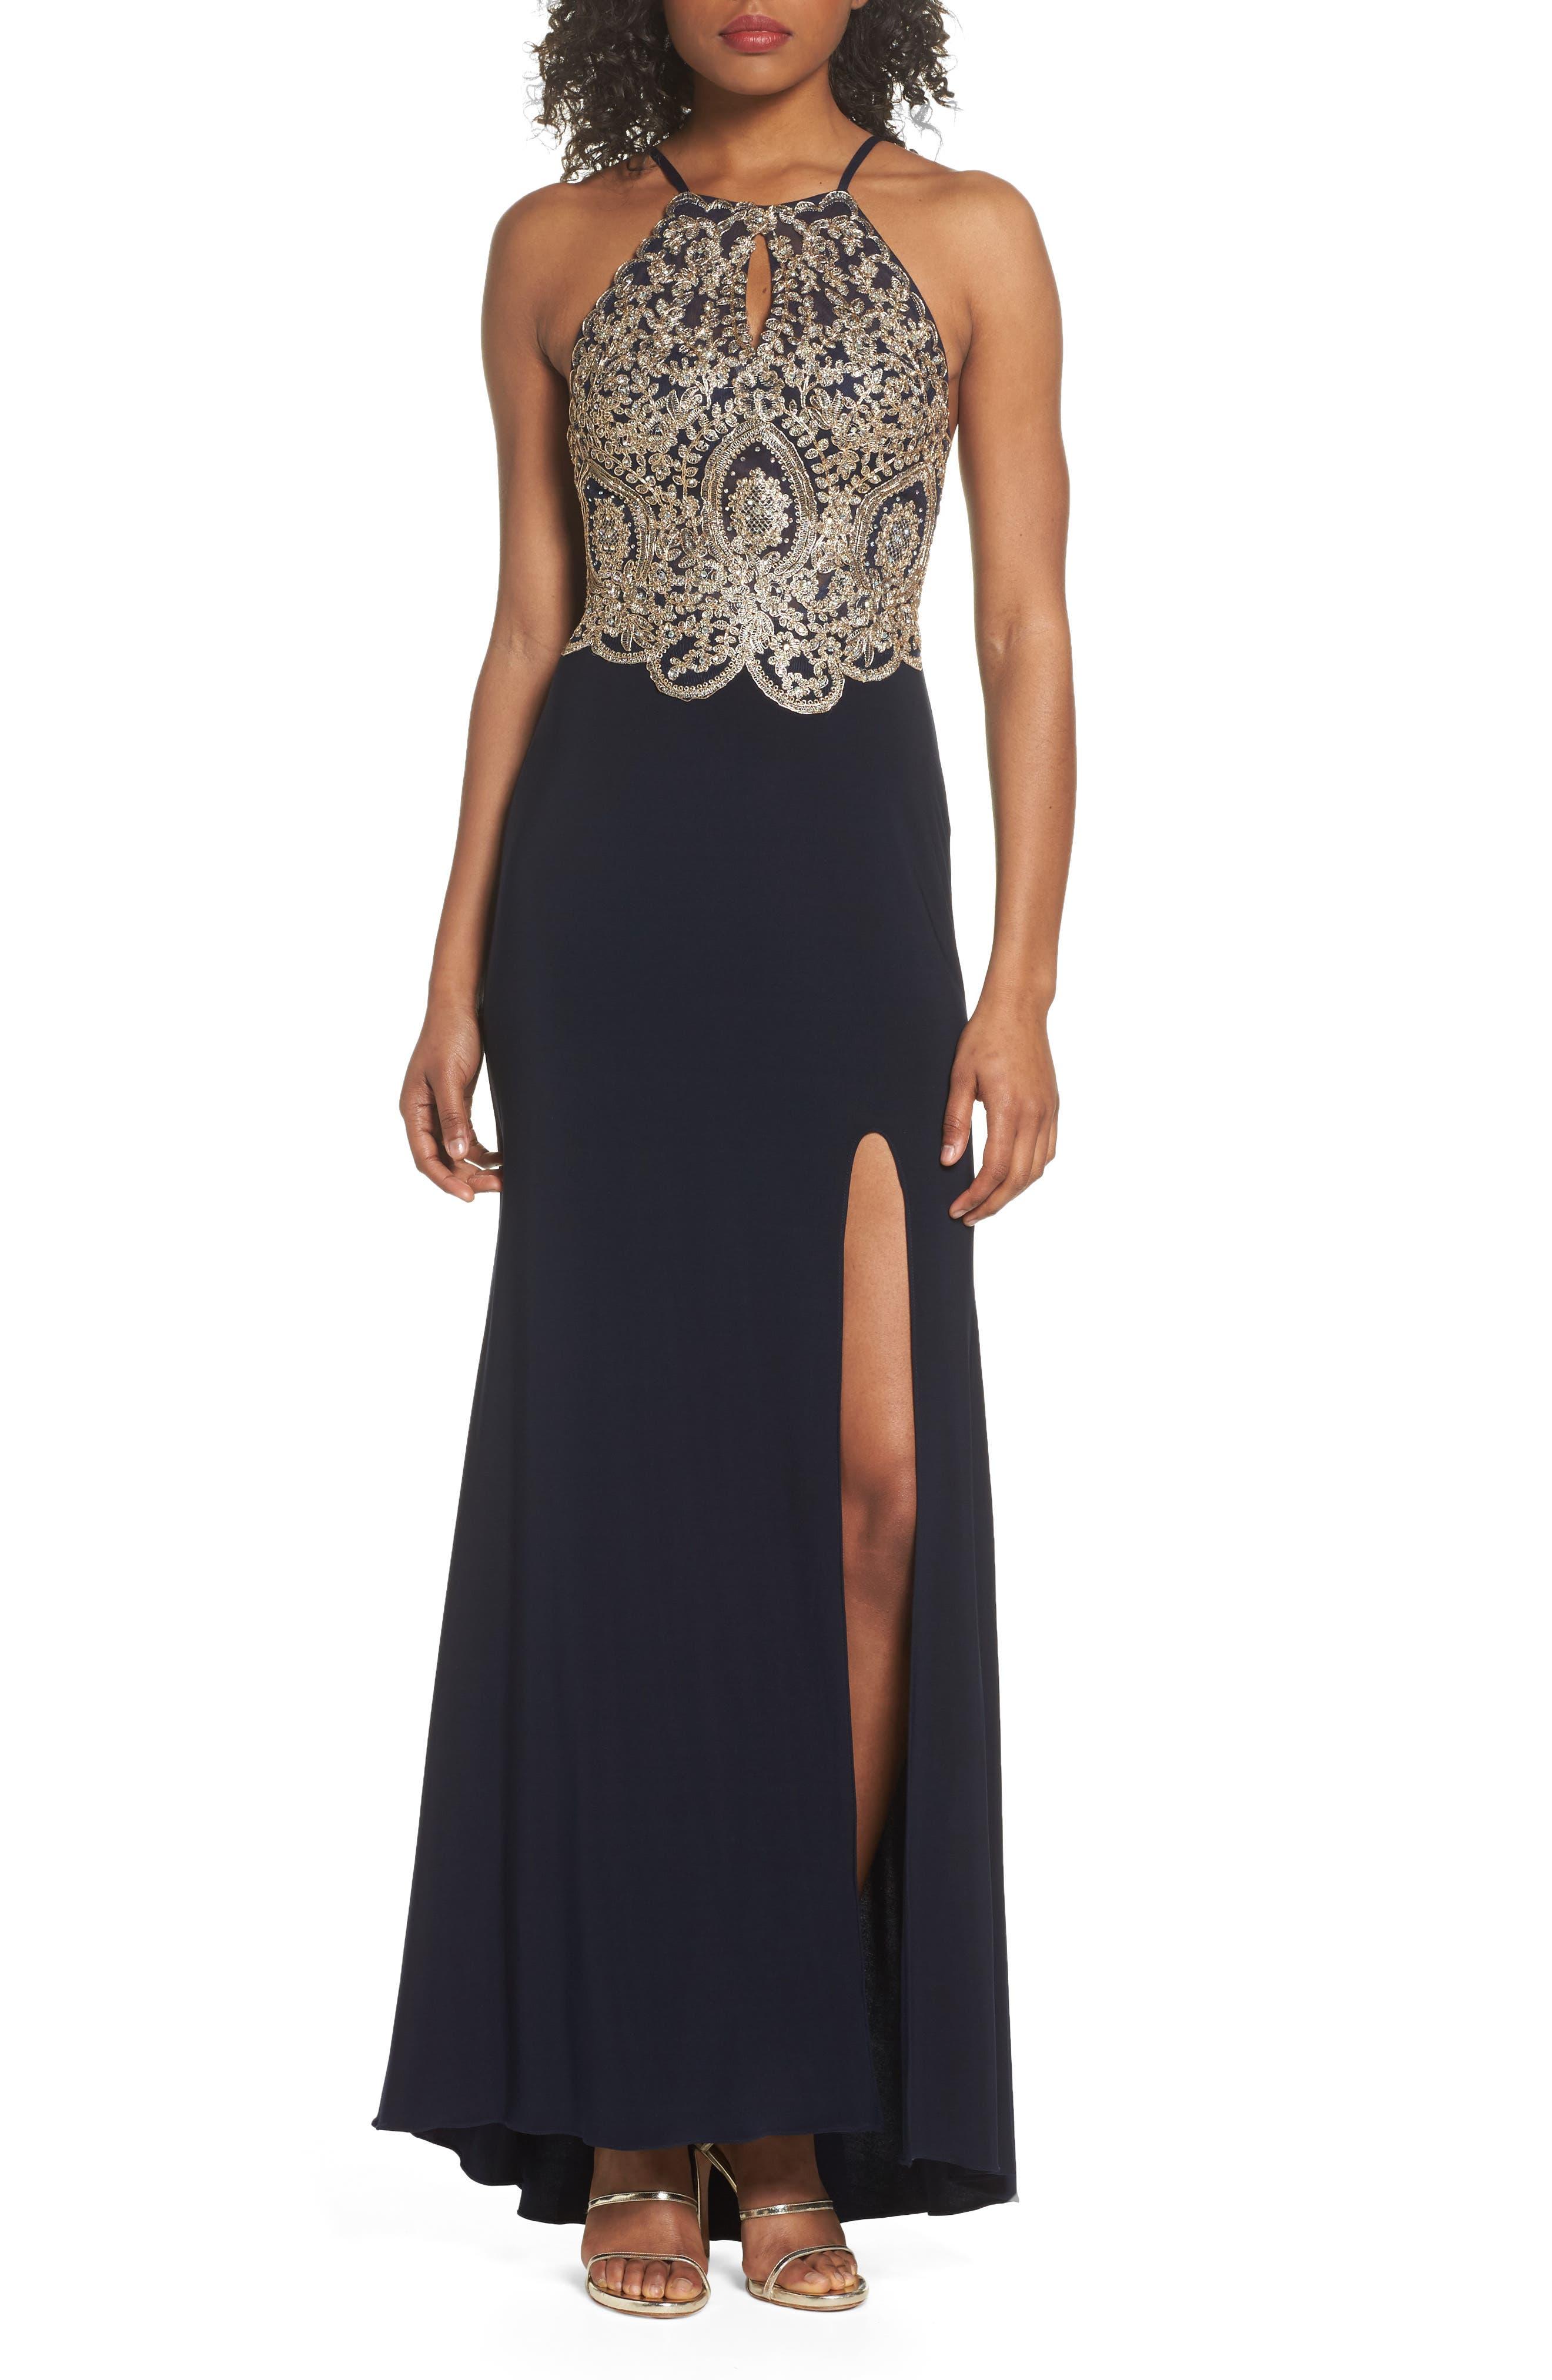 Blondie Nites Embellished Appliqué Halter Gown